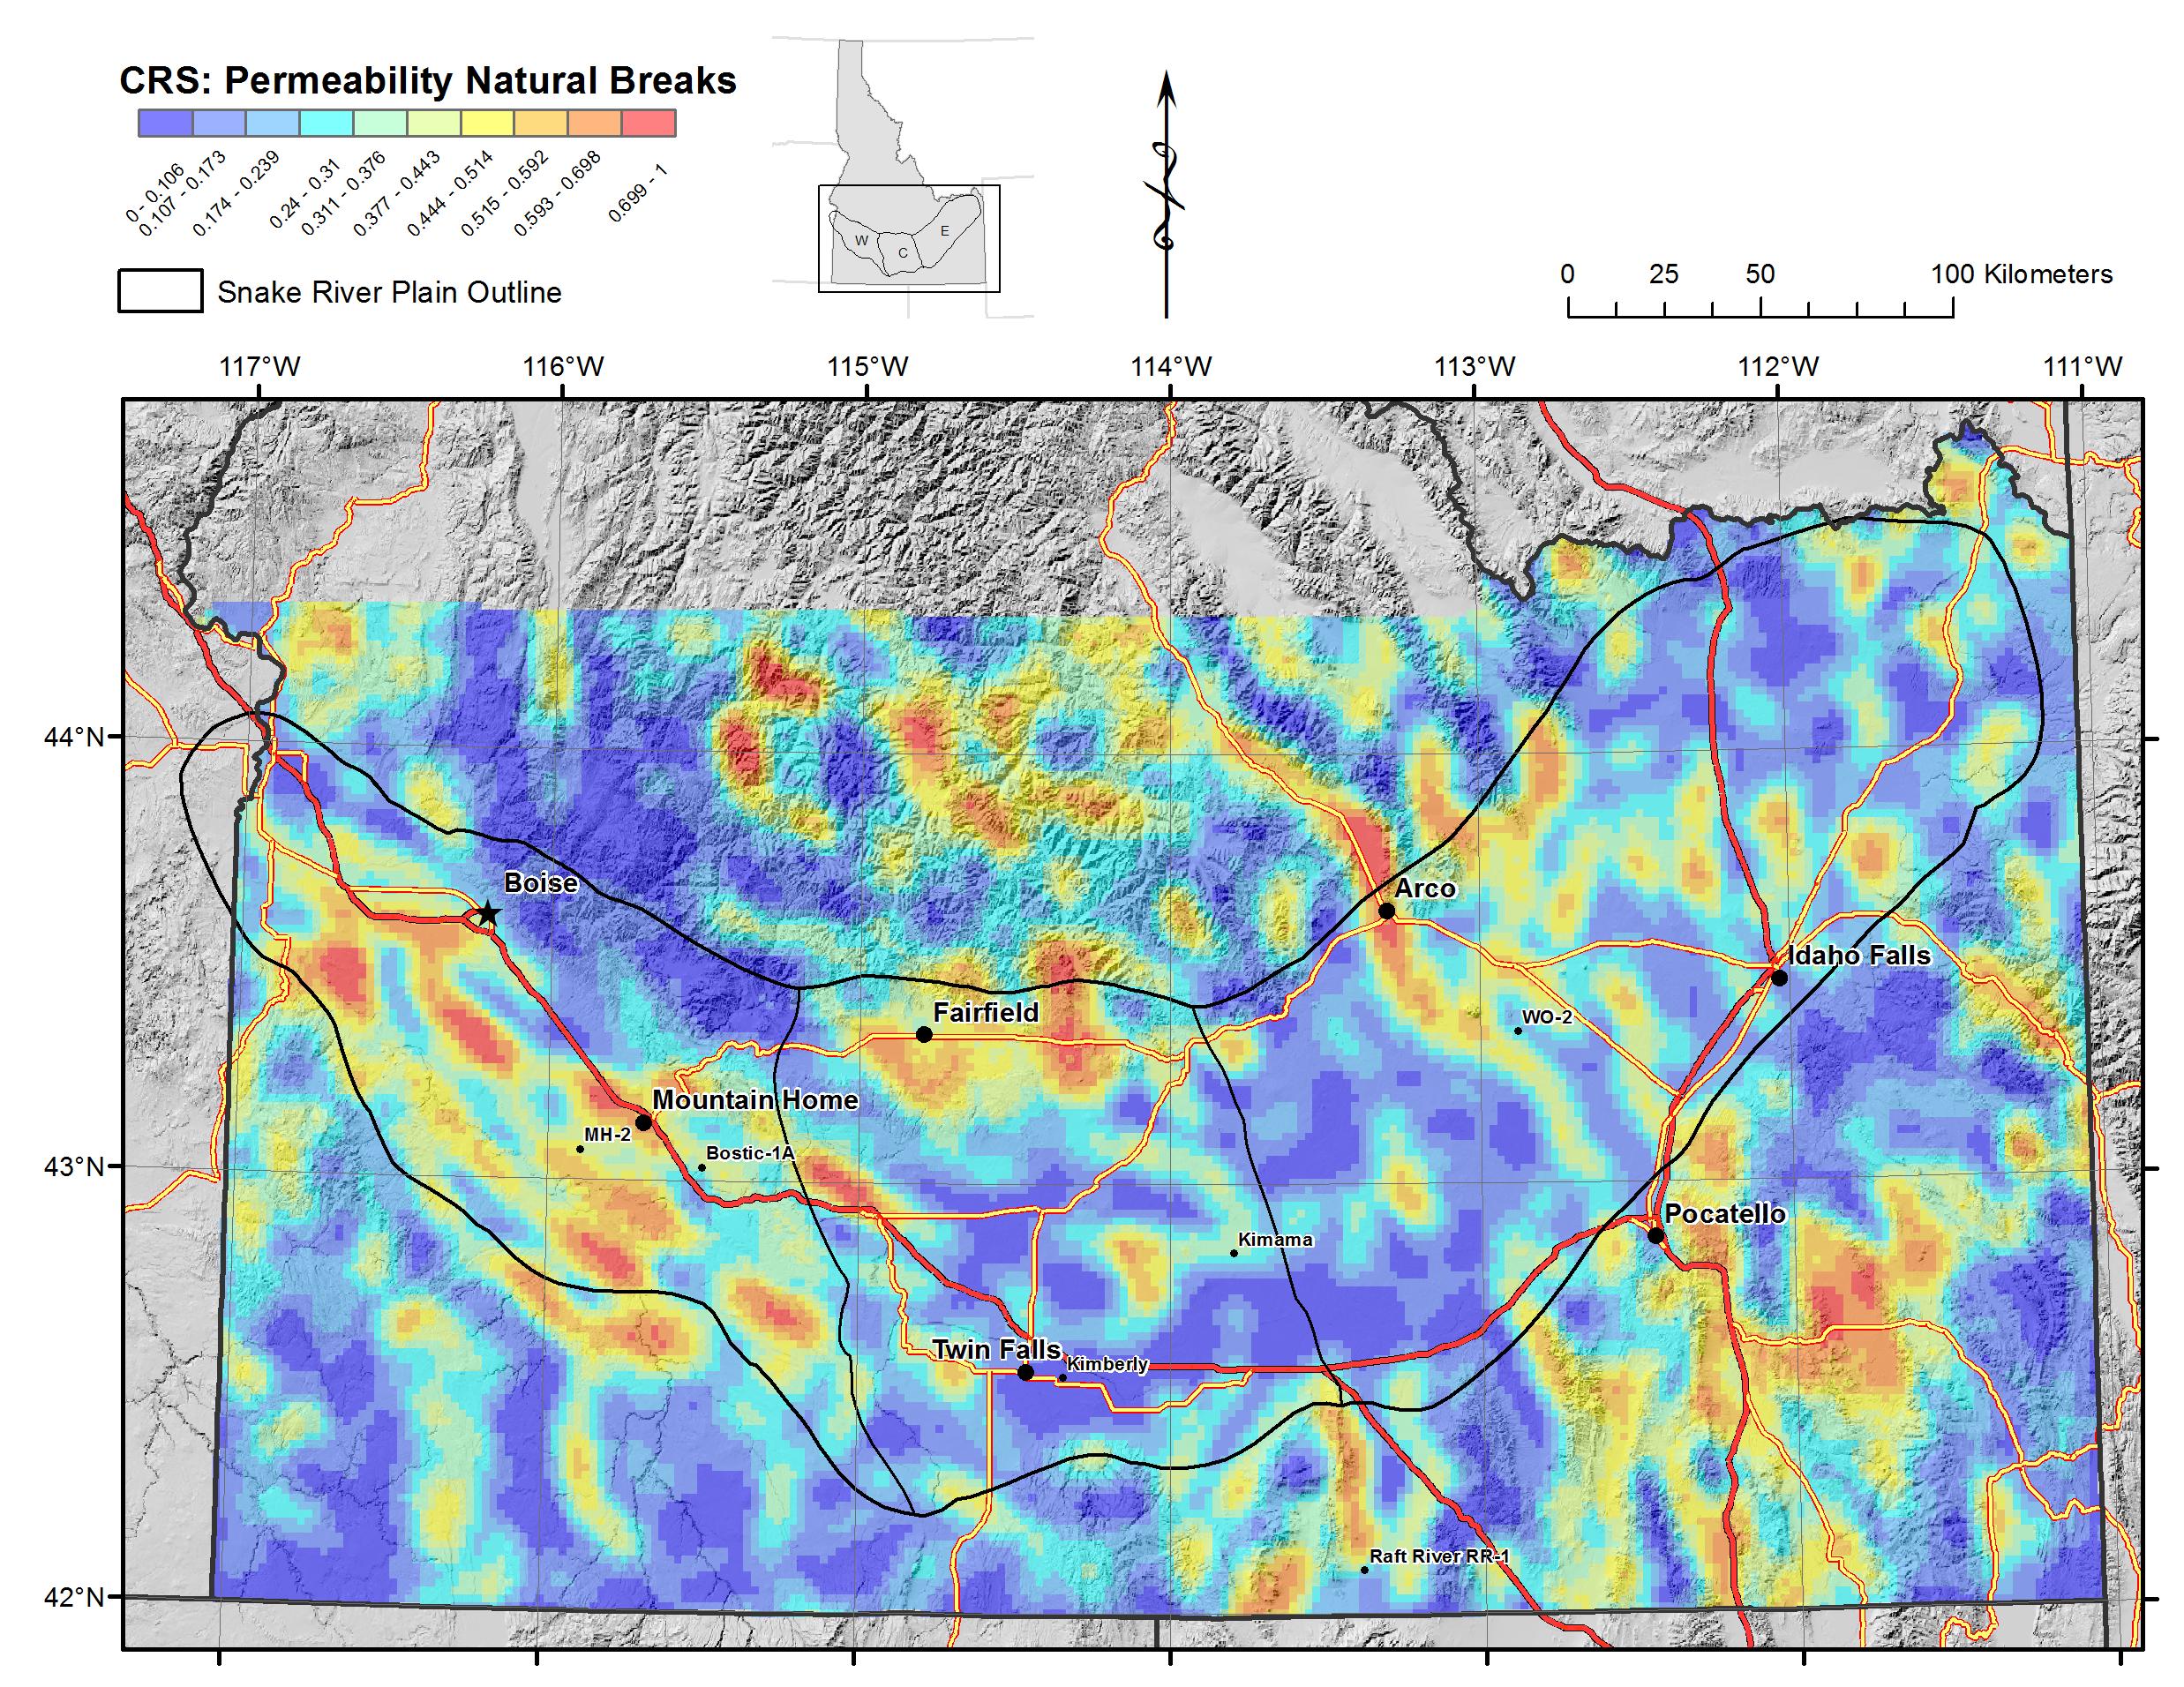 Snake River Plain Geothermal Play Fairway Analysis Raster